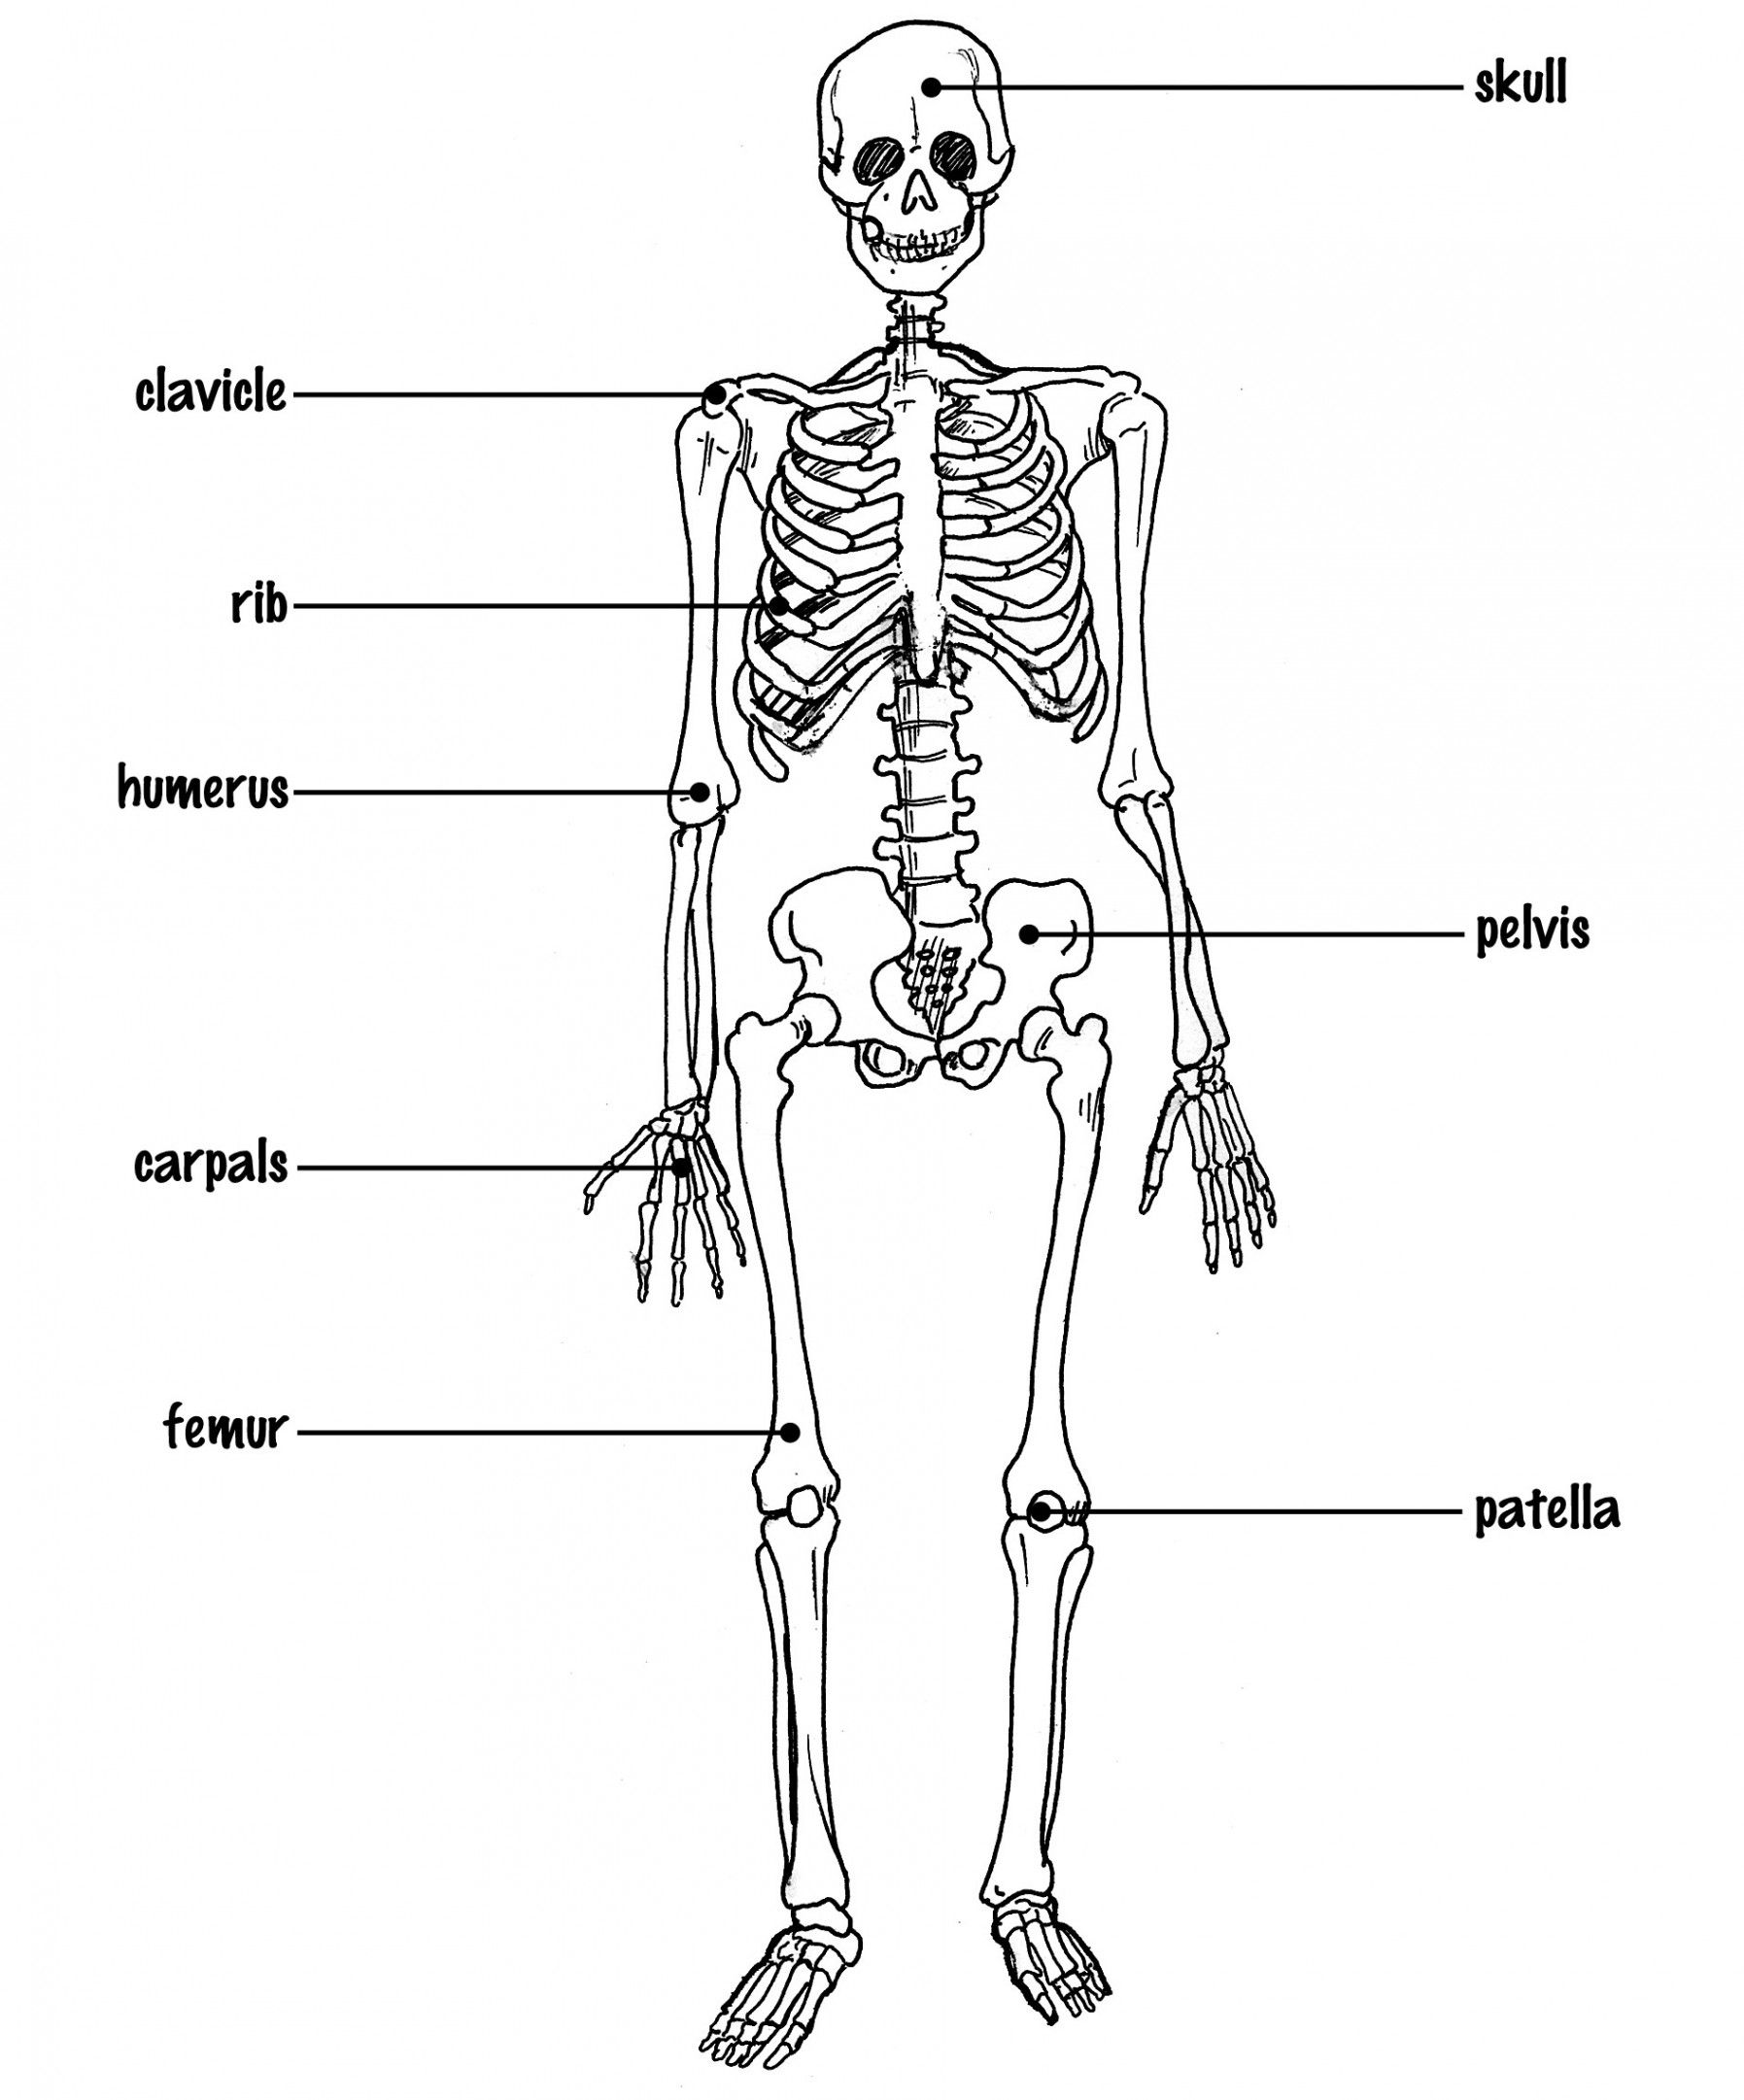 medium resolution of unlabeled human skeleton diagram unlabeled human skeleton diagram blank human skeleton stream the awesome web